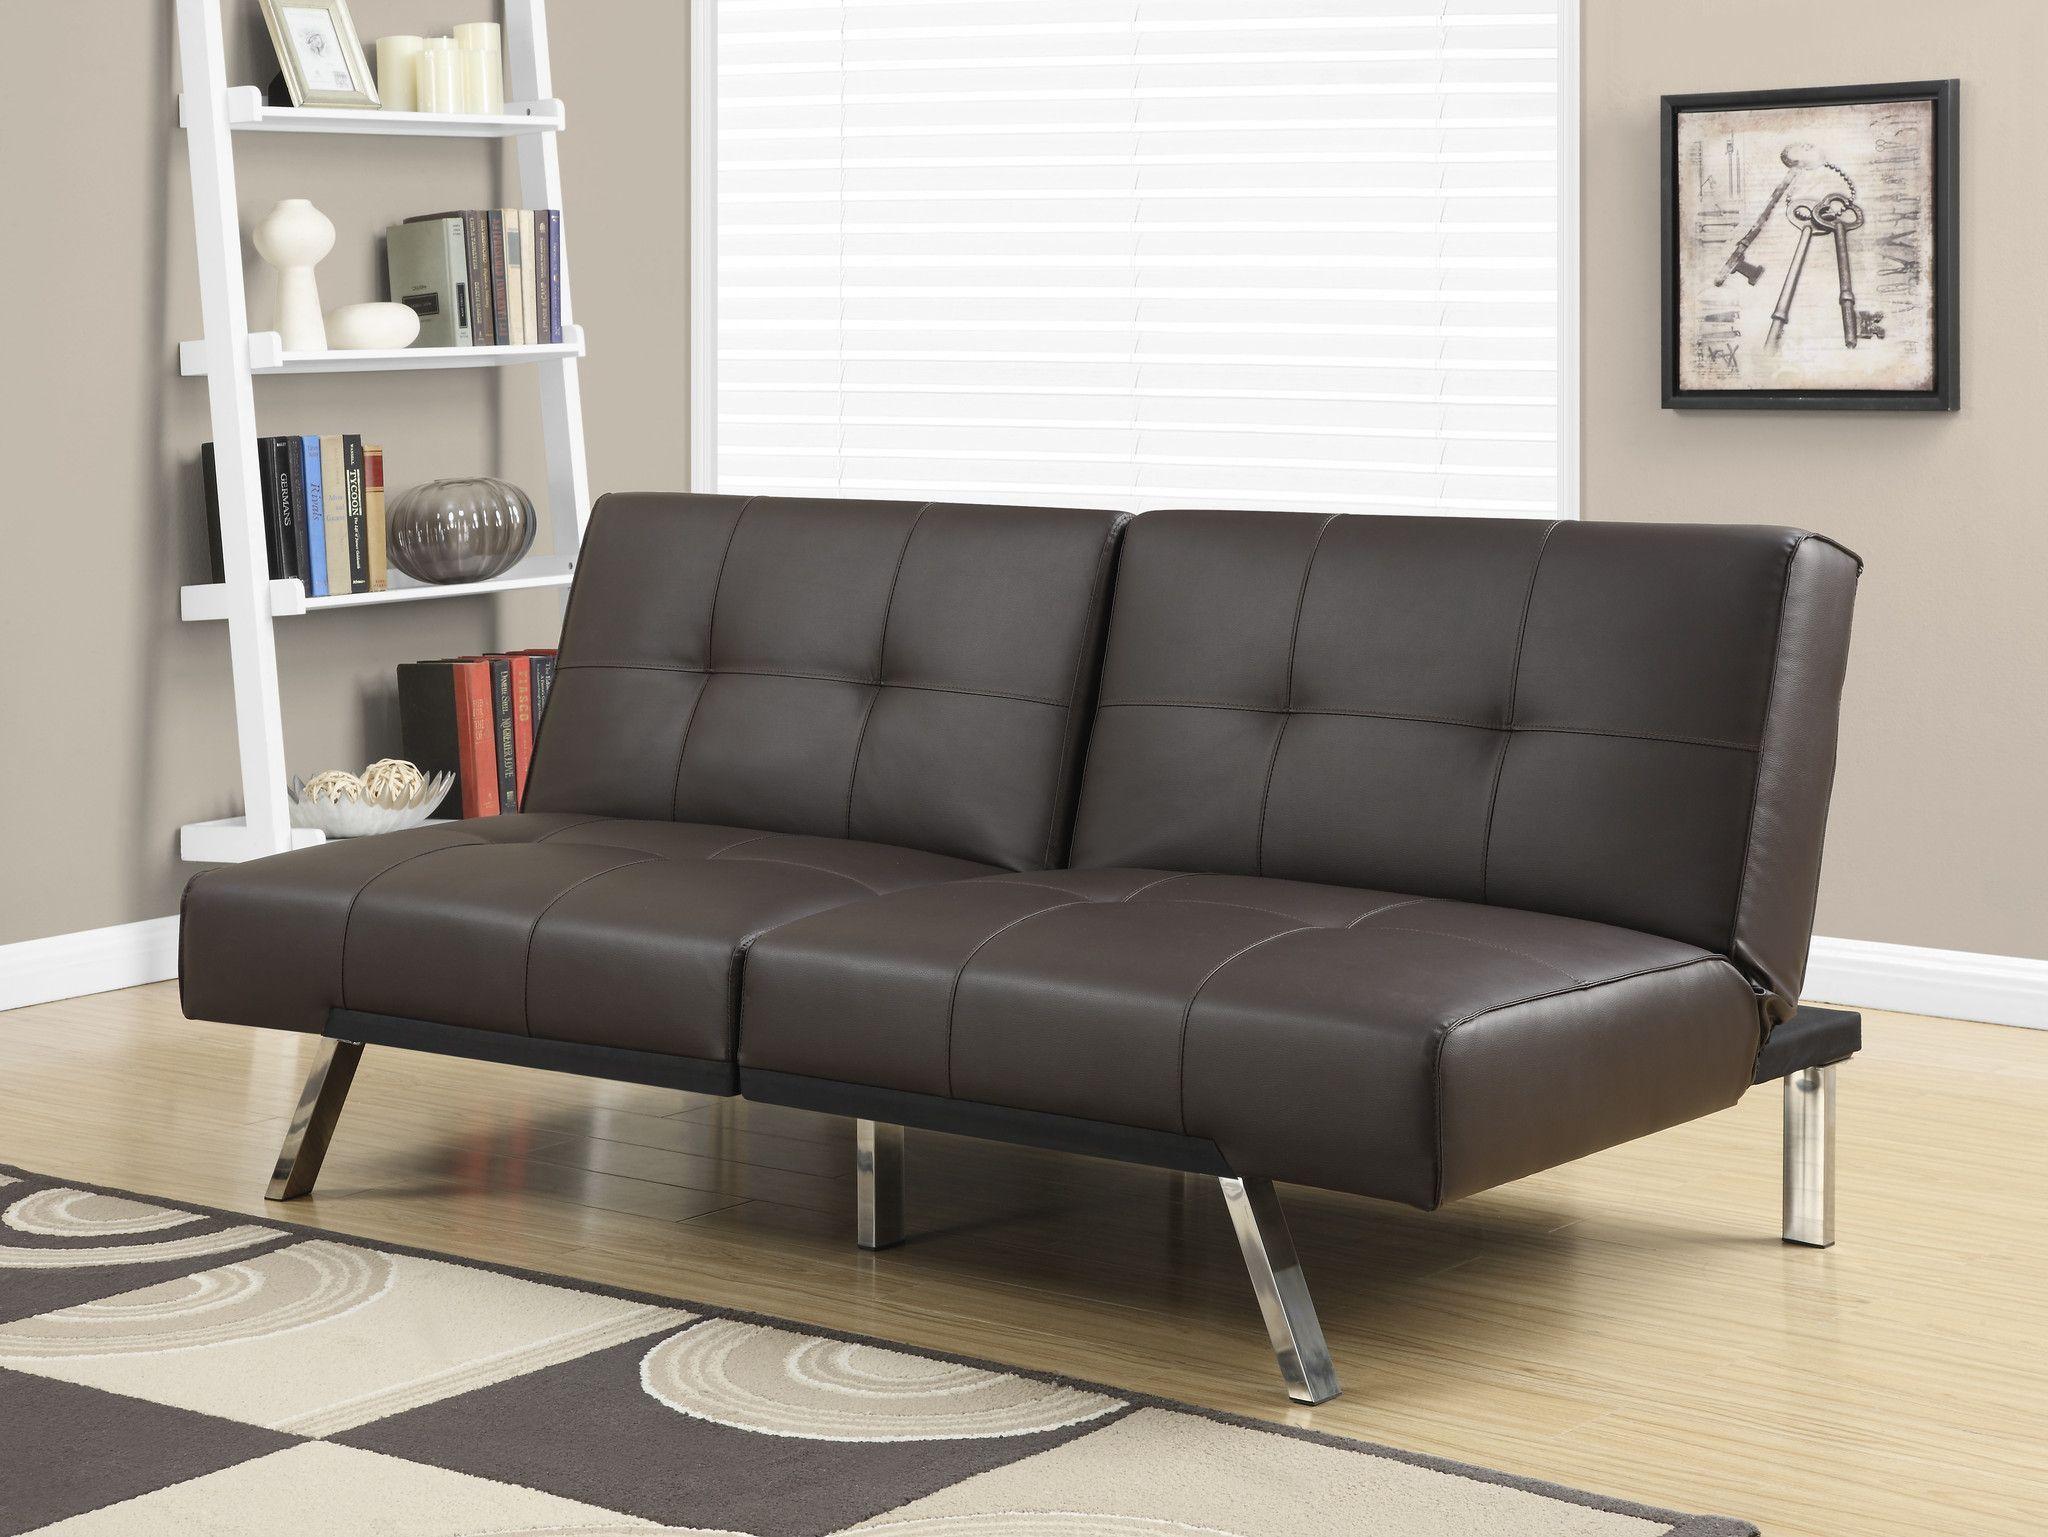 Futon Split Back Click Clack / Dark Brown LeatherLook